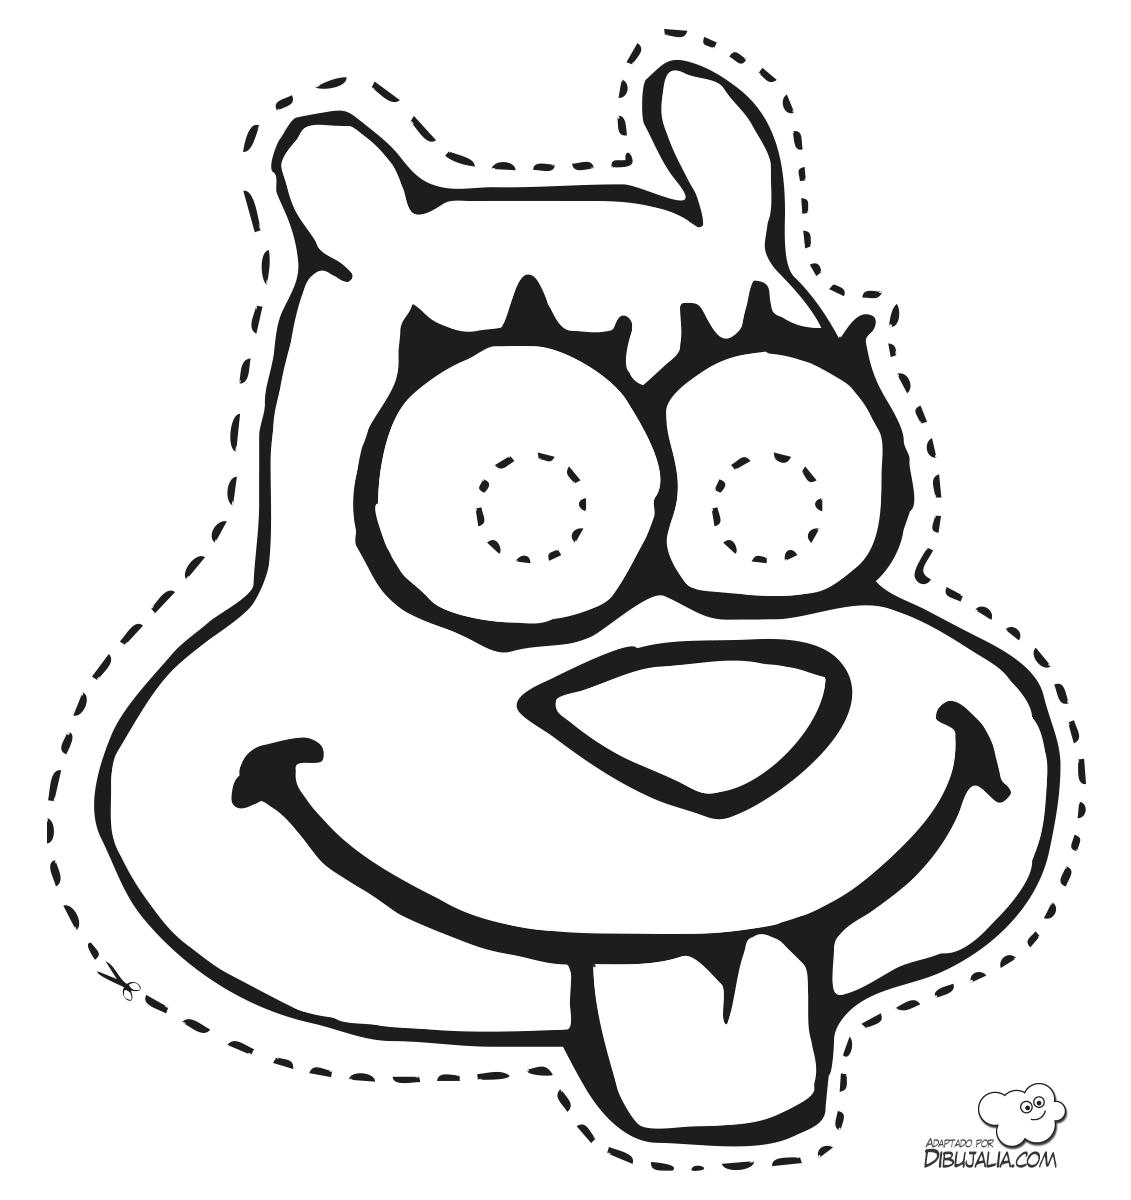 mascara-bob-esponja-dibujalia-4.png (1131×1200) | Colorear ...